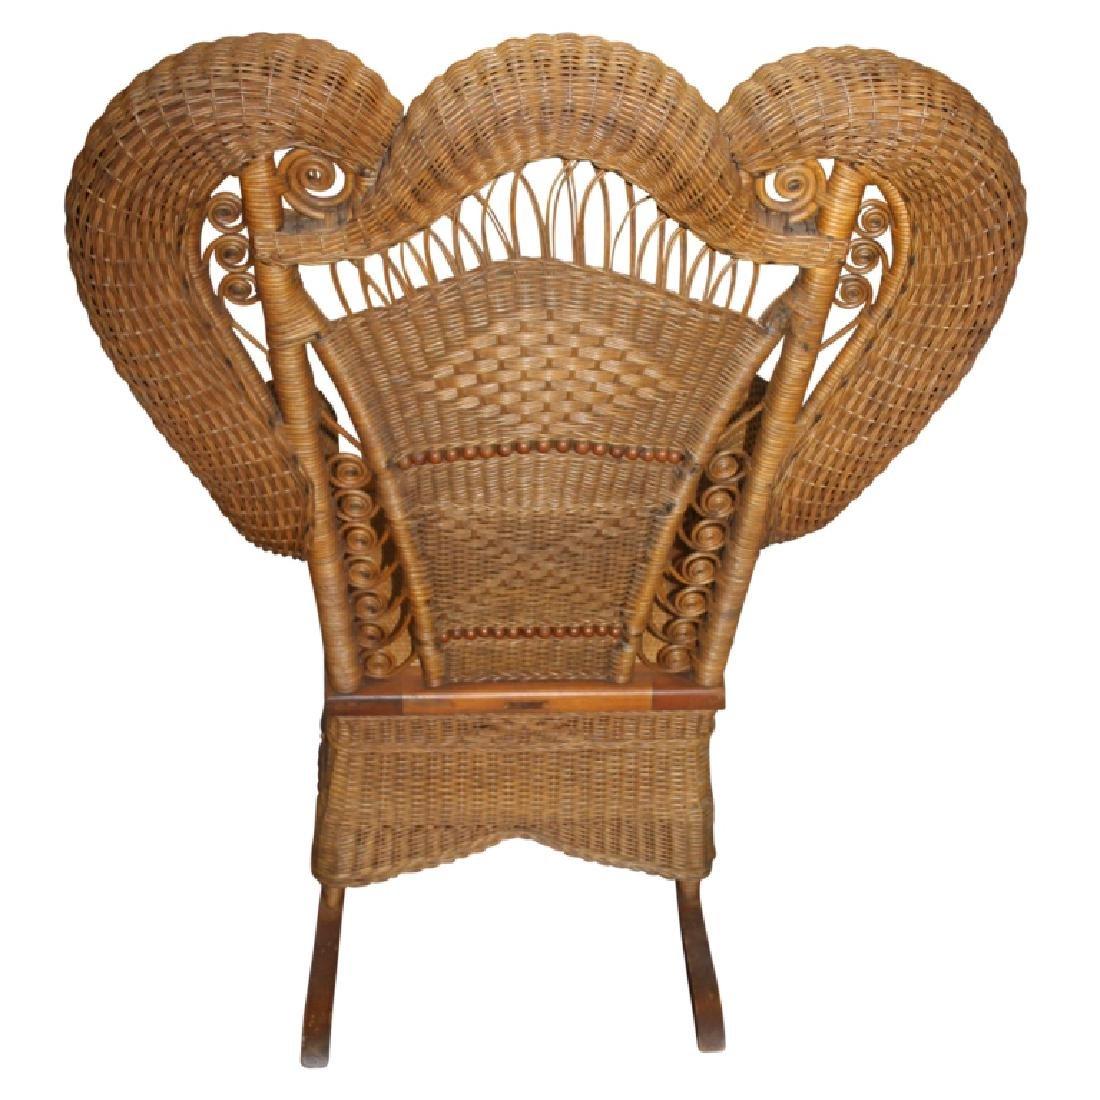 Heywood Wakefield Wicker Style Rocking Chair - 4